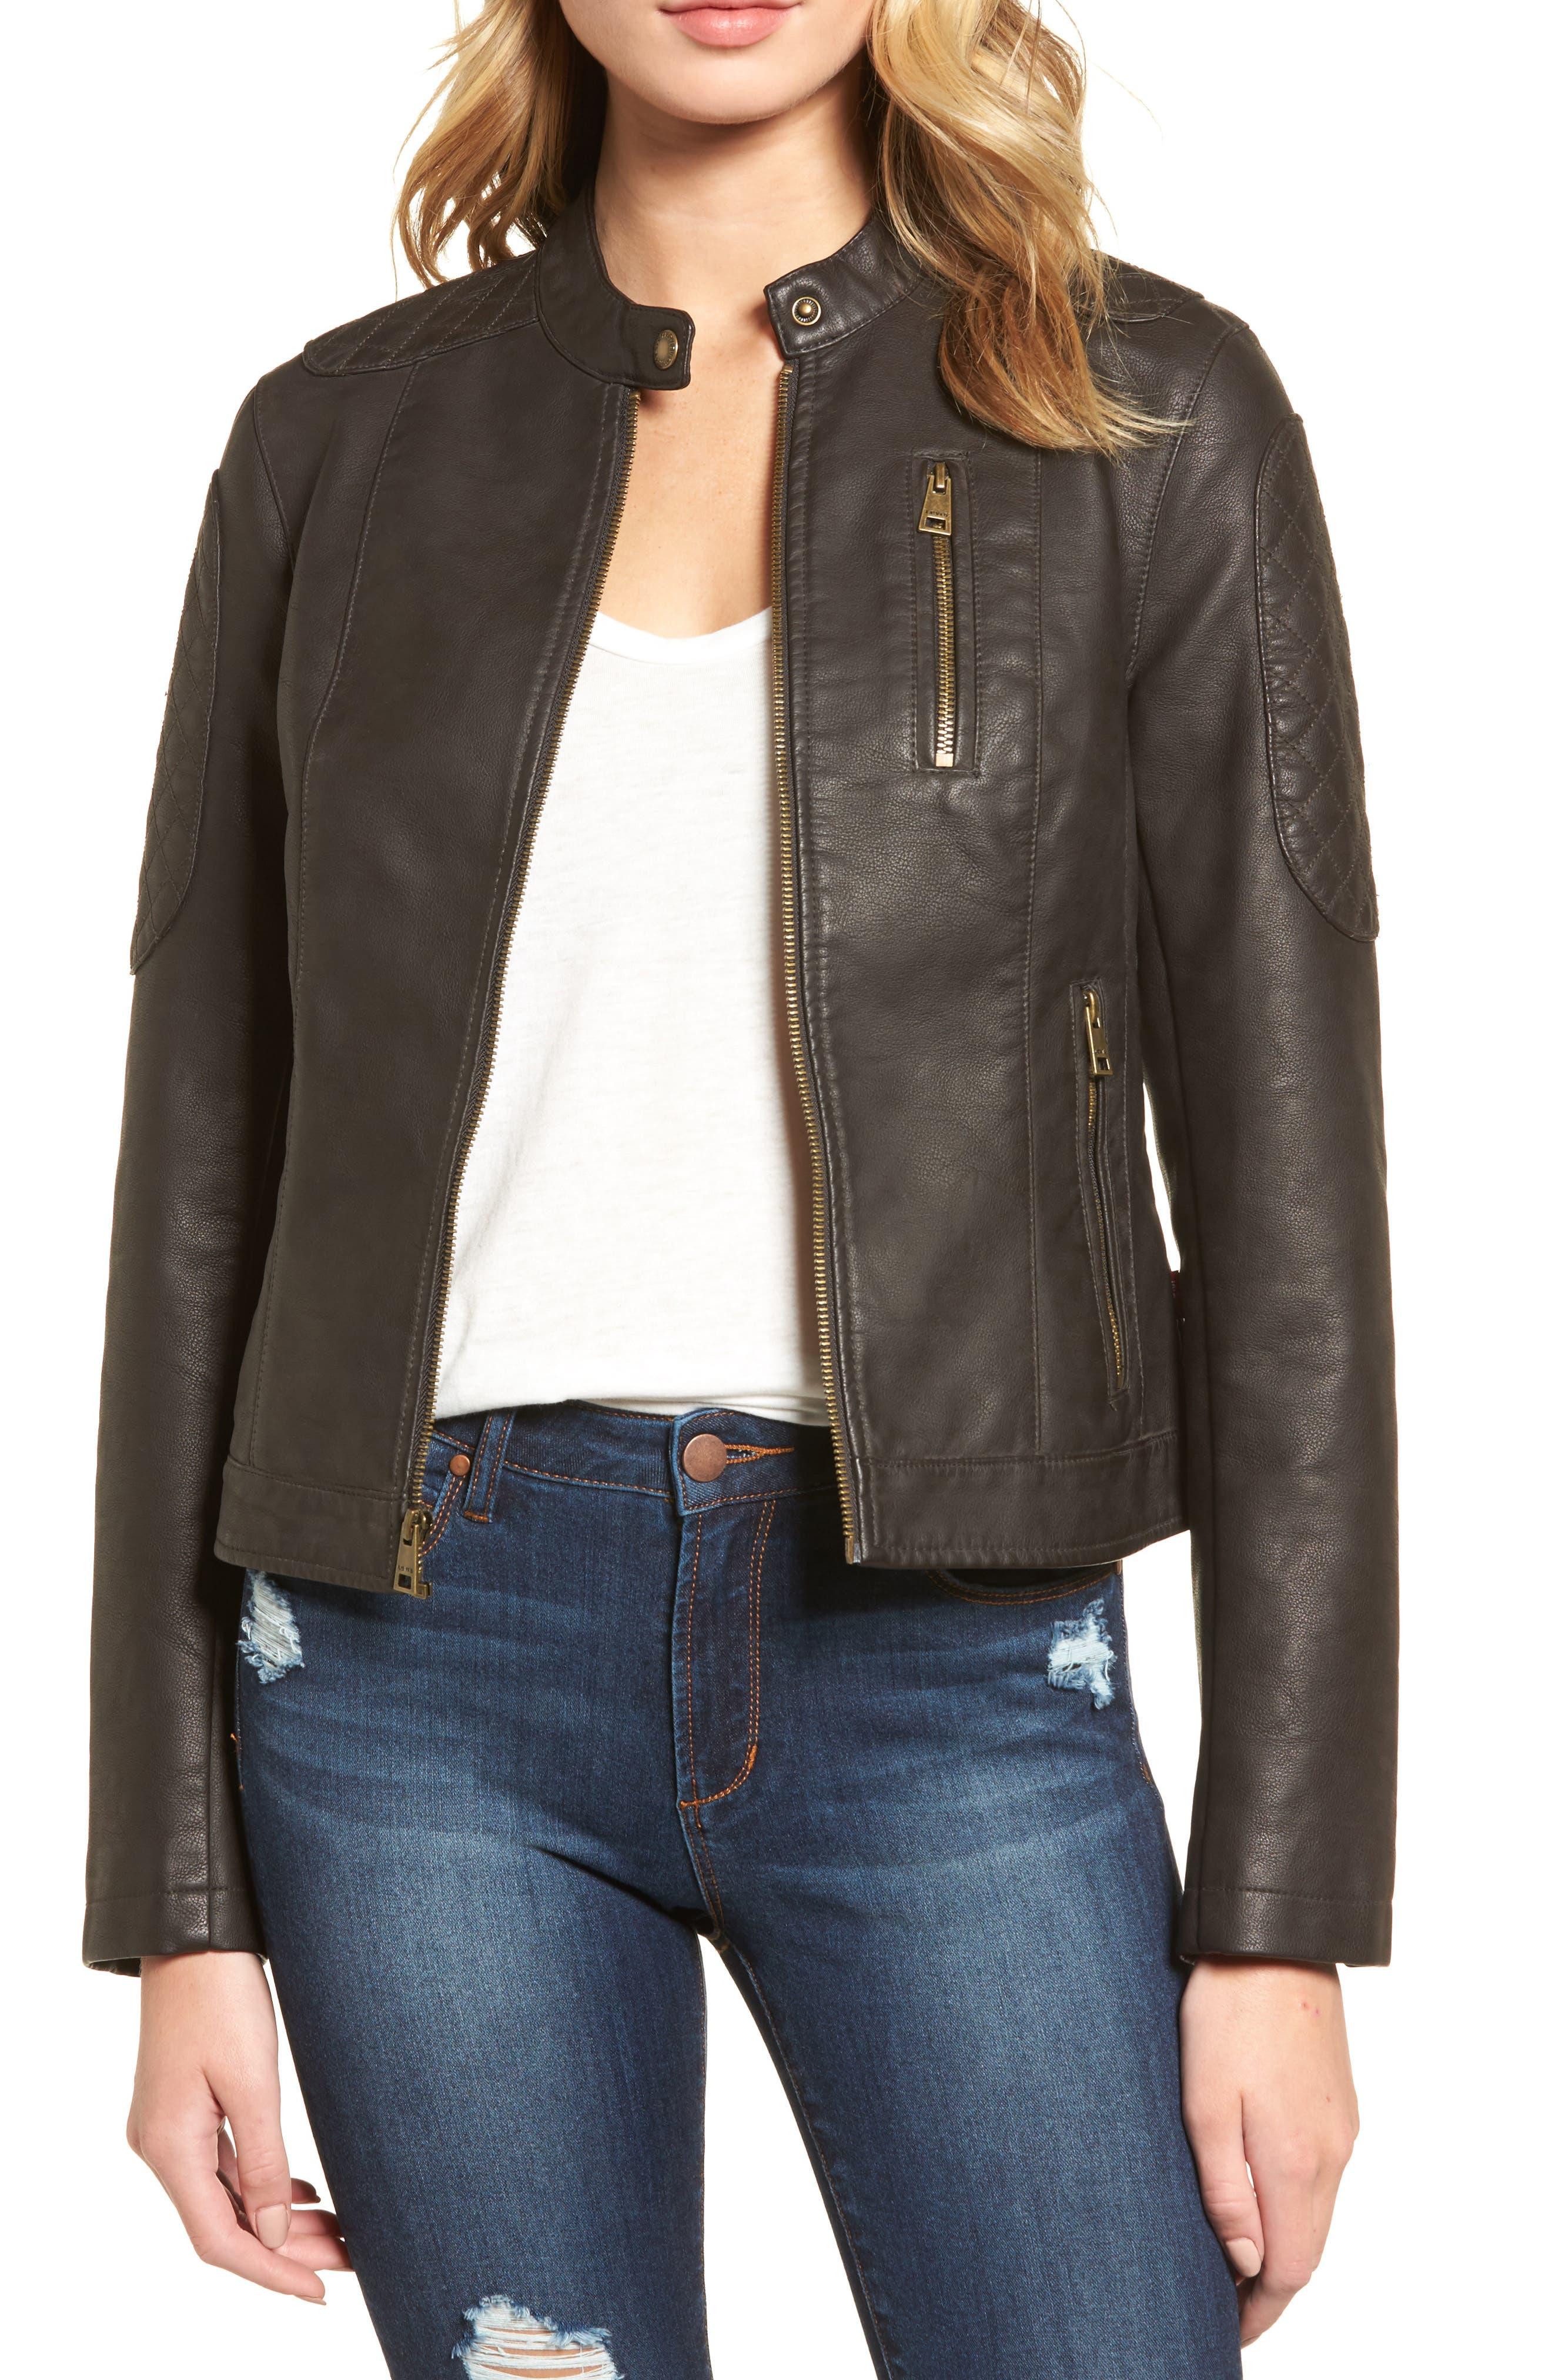 LEVIS<sup>®</sup> Faux Leather Moto Jacket,                             Main thumbnail 1, color,                             Brown